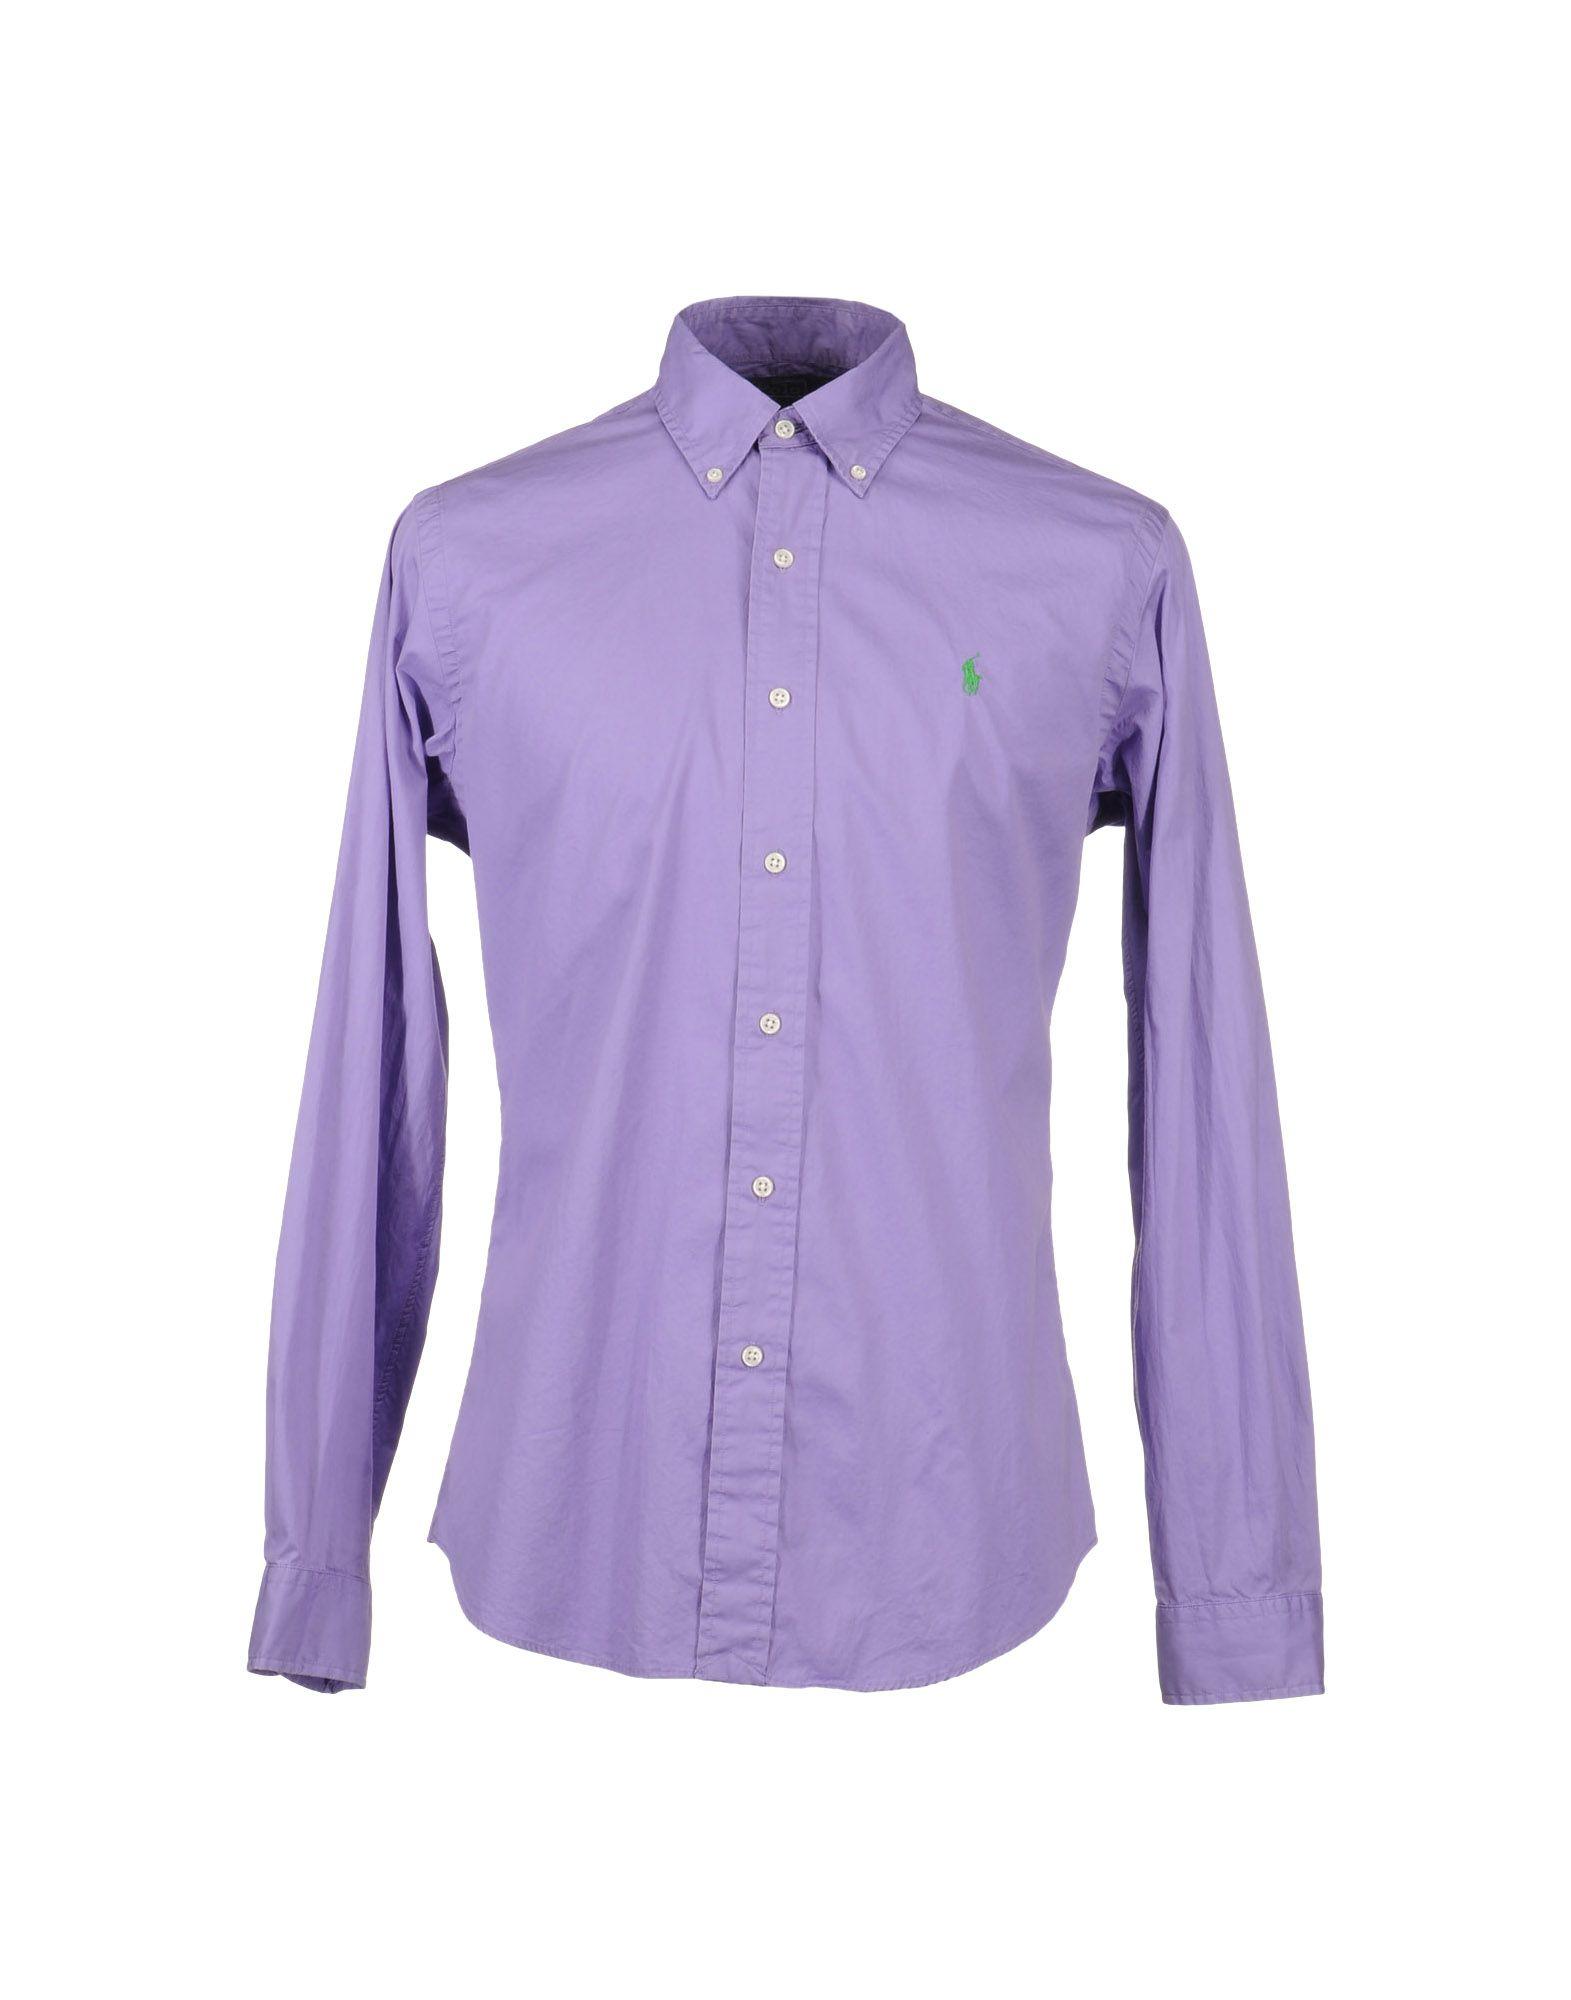 Polo ralph lauren long sleeve shirt in purple for men for Long sleeve purple polo shirt